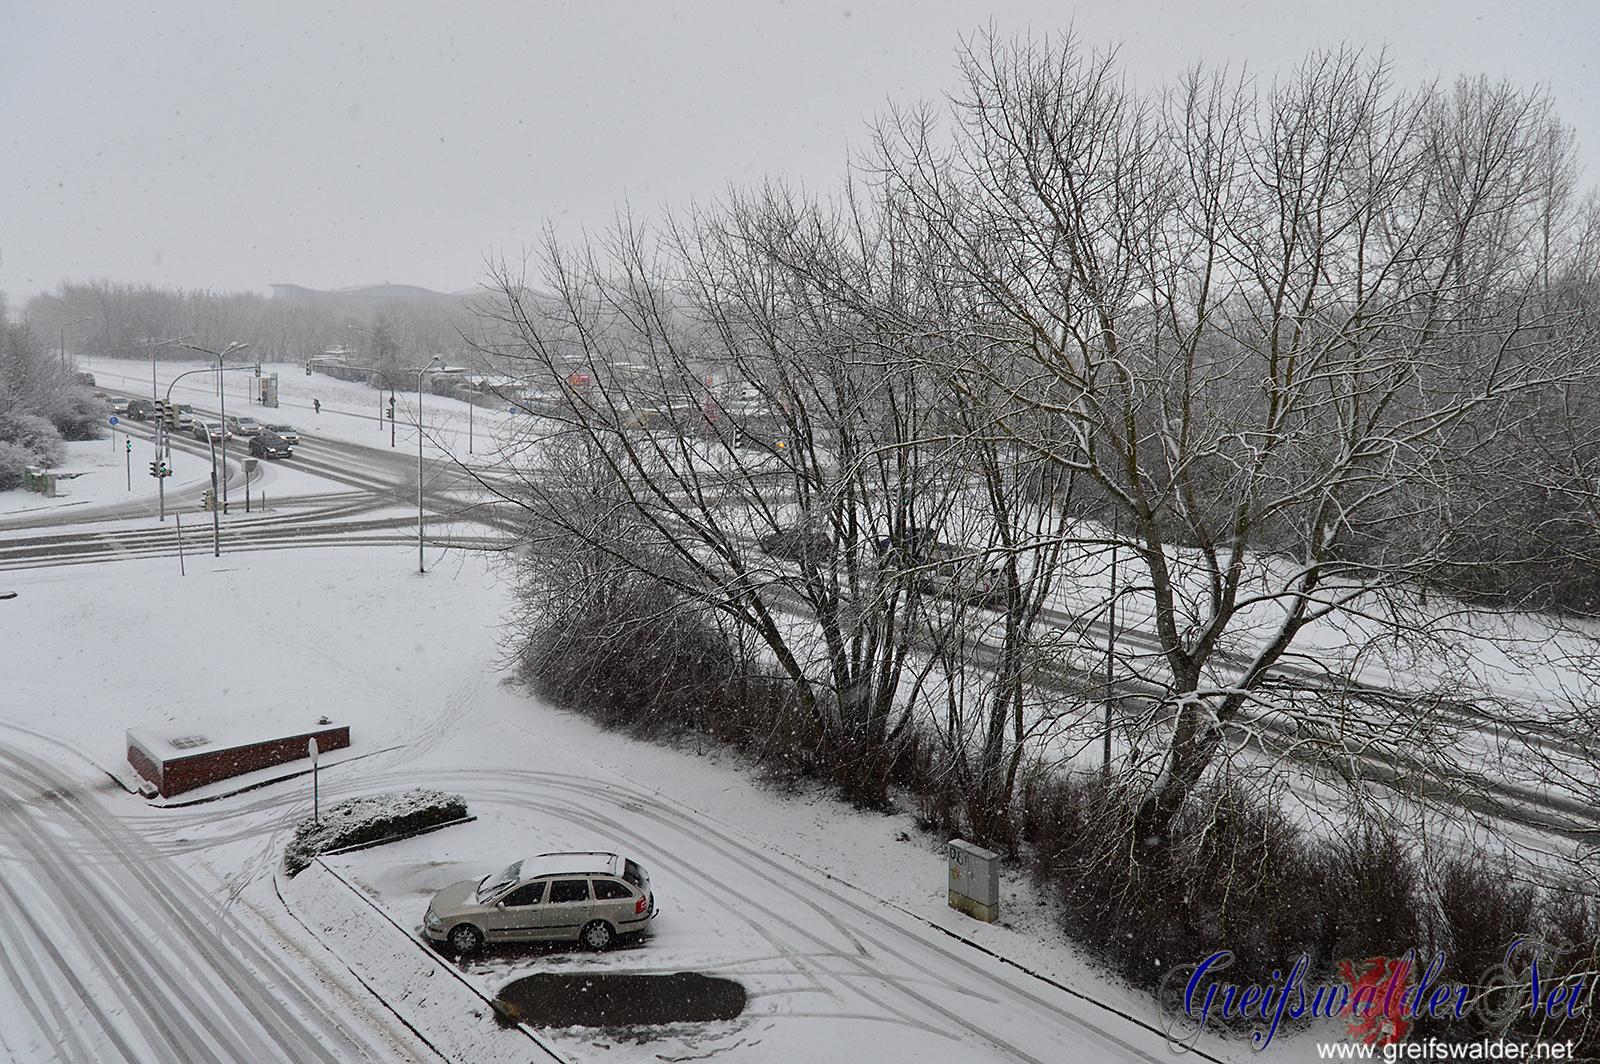 Schneefall in Greifswald